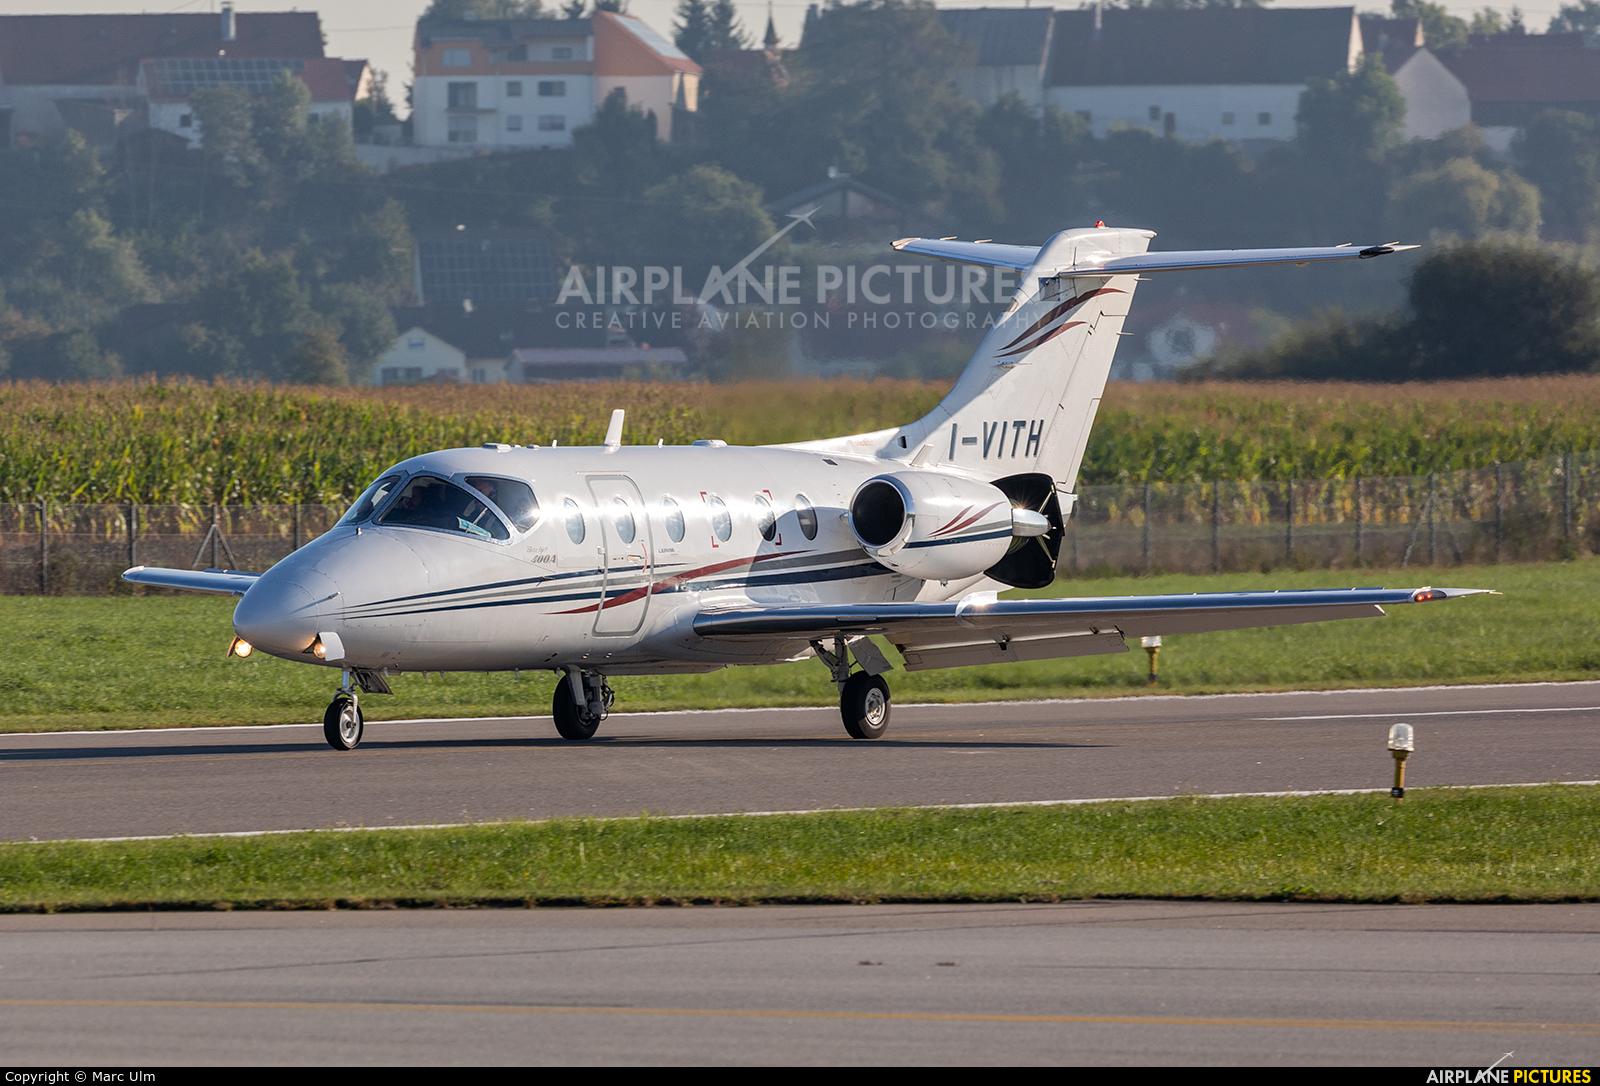 Private I-VITH aircraft at Augsburg